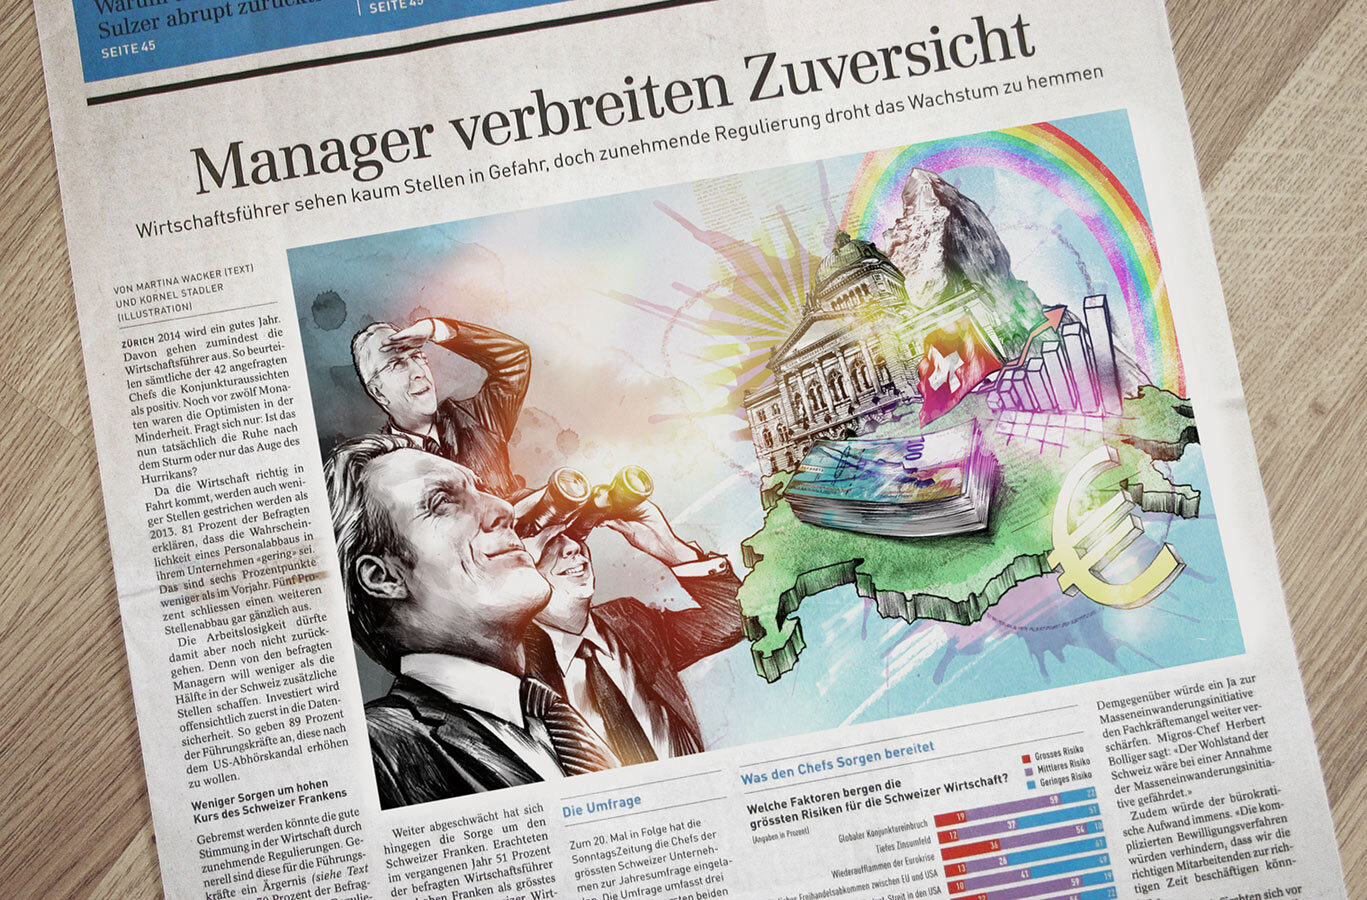 Sonntagszeitung manager - Kornel Illustration | Kornel Stadler portfolio